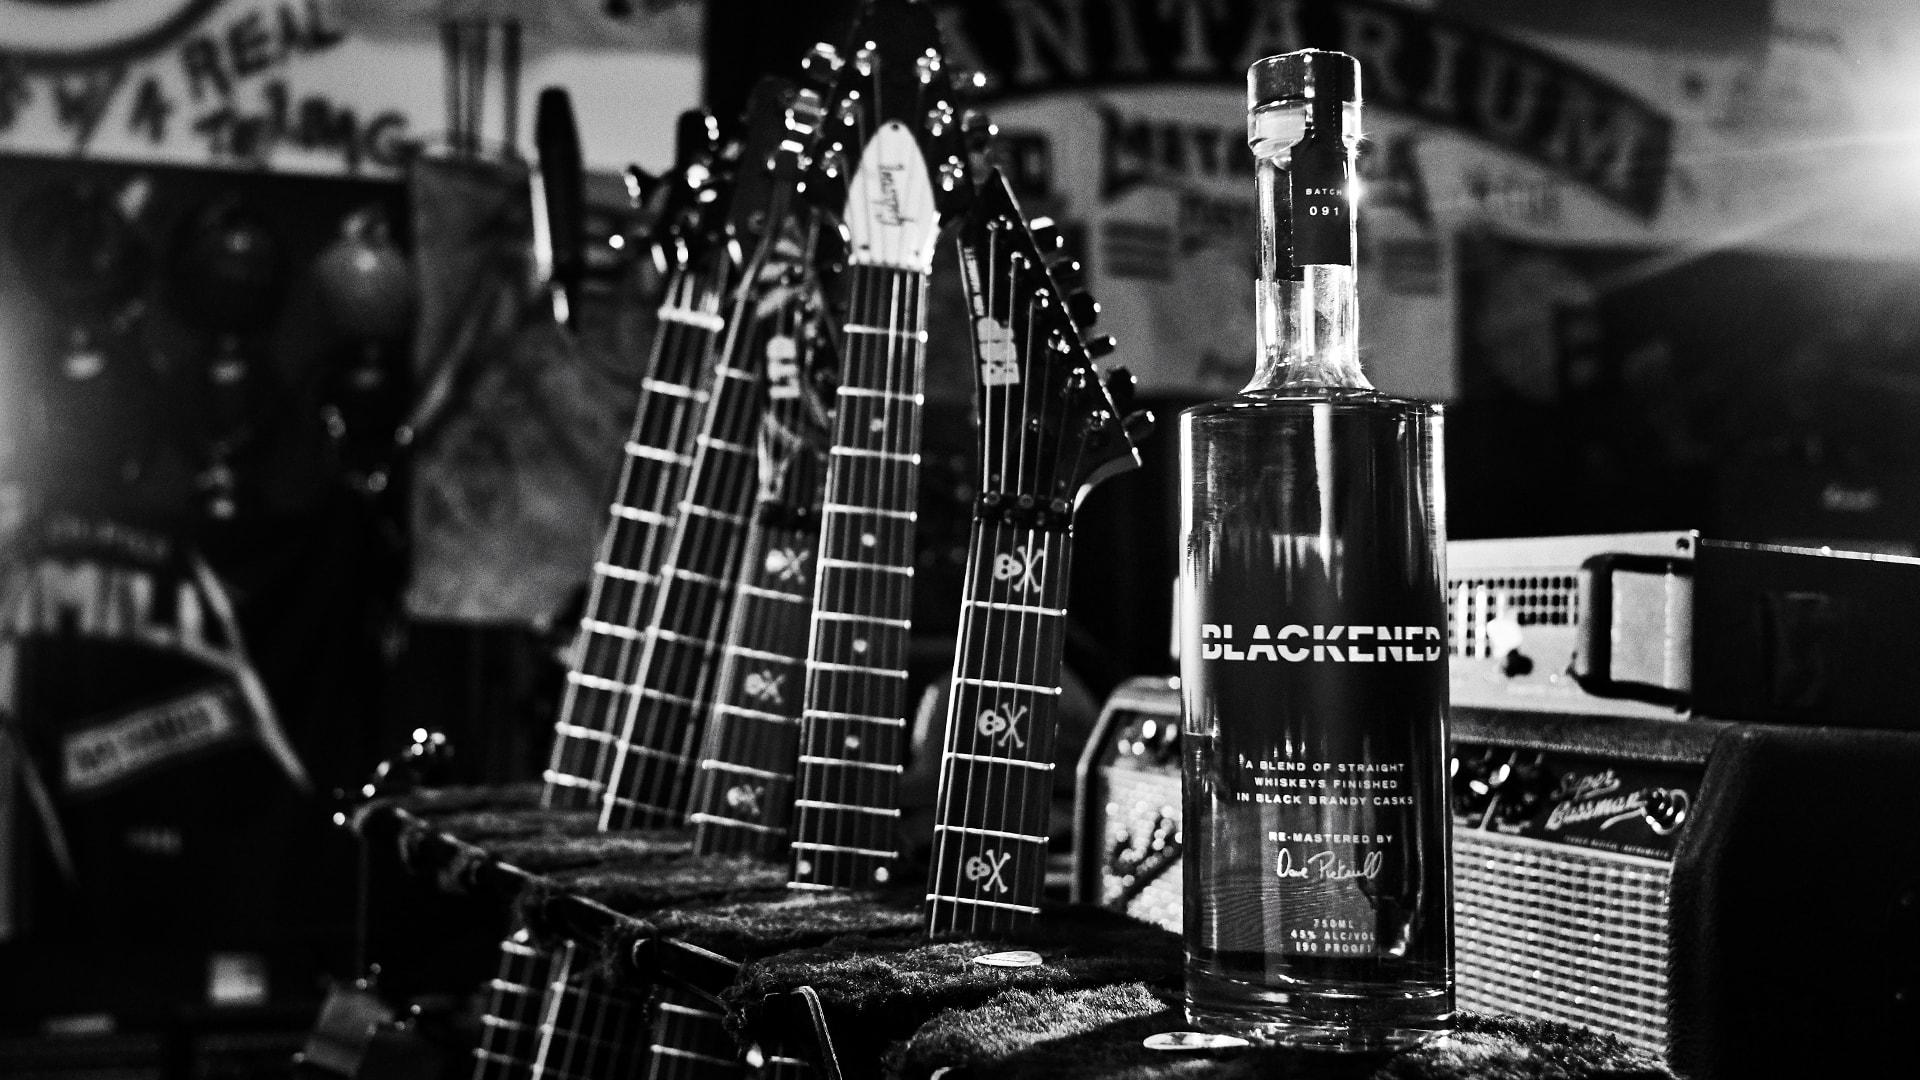 Blackened whiskey bottle